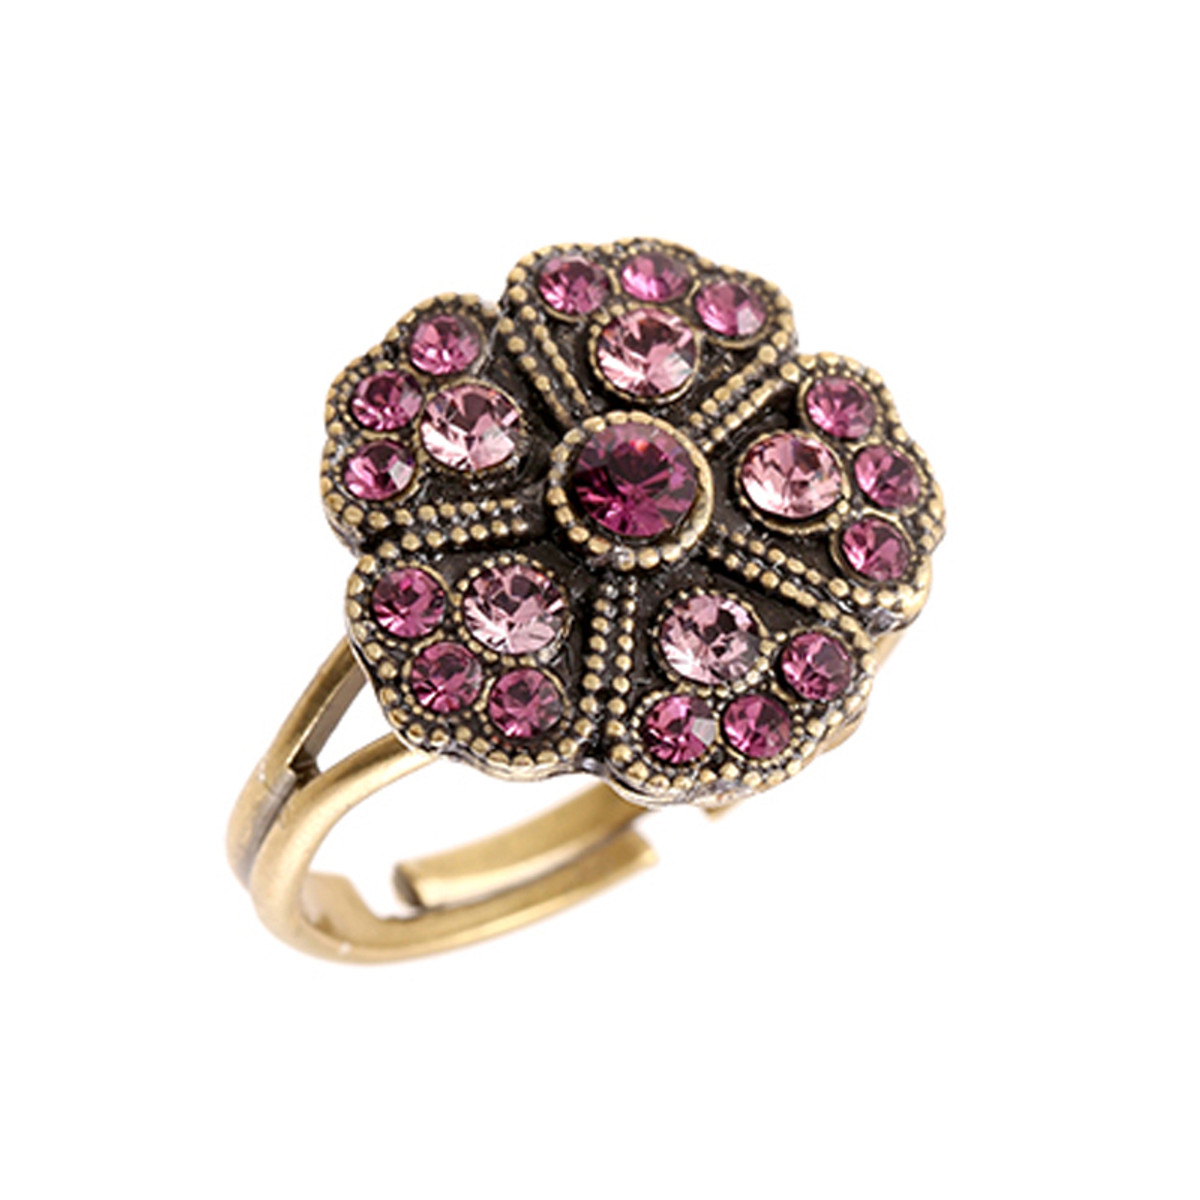 Michal Negrin Jade Swarovski crystals Flower Ring